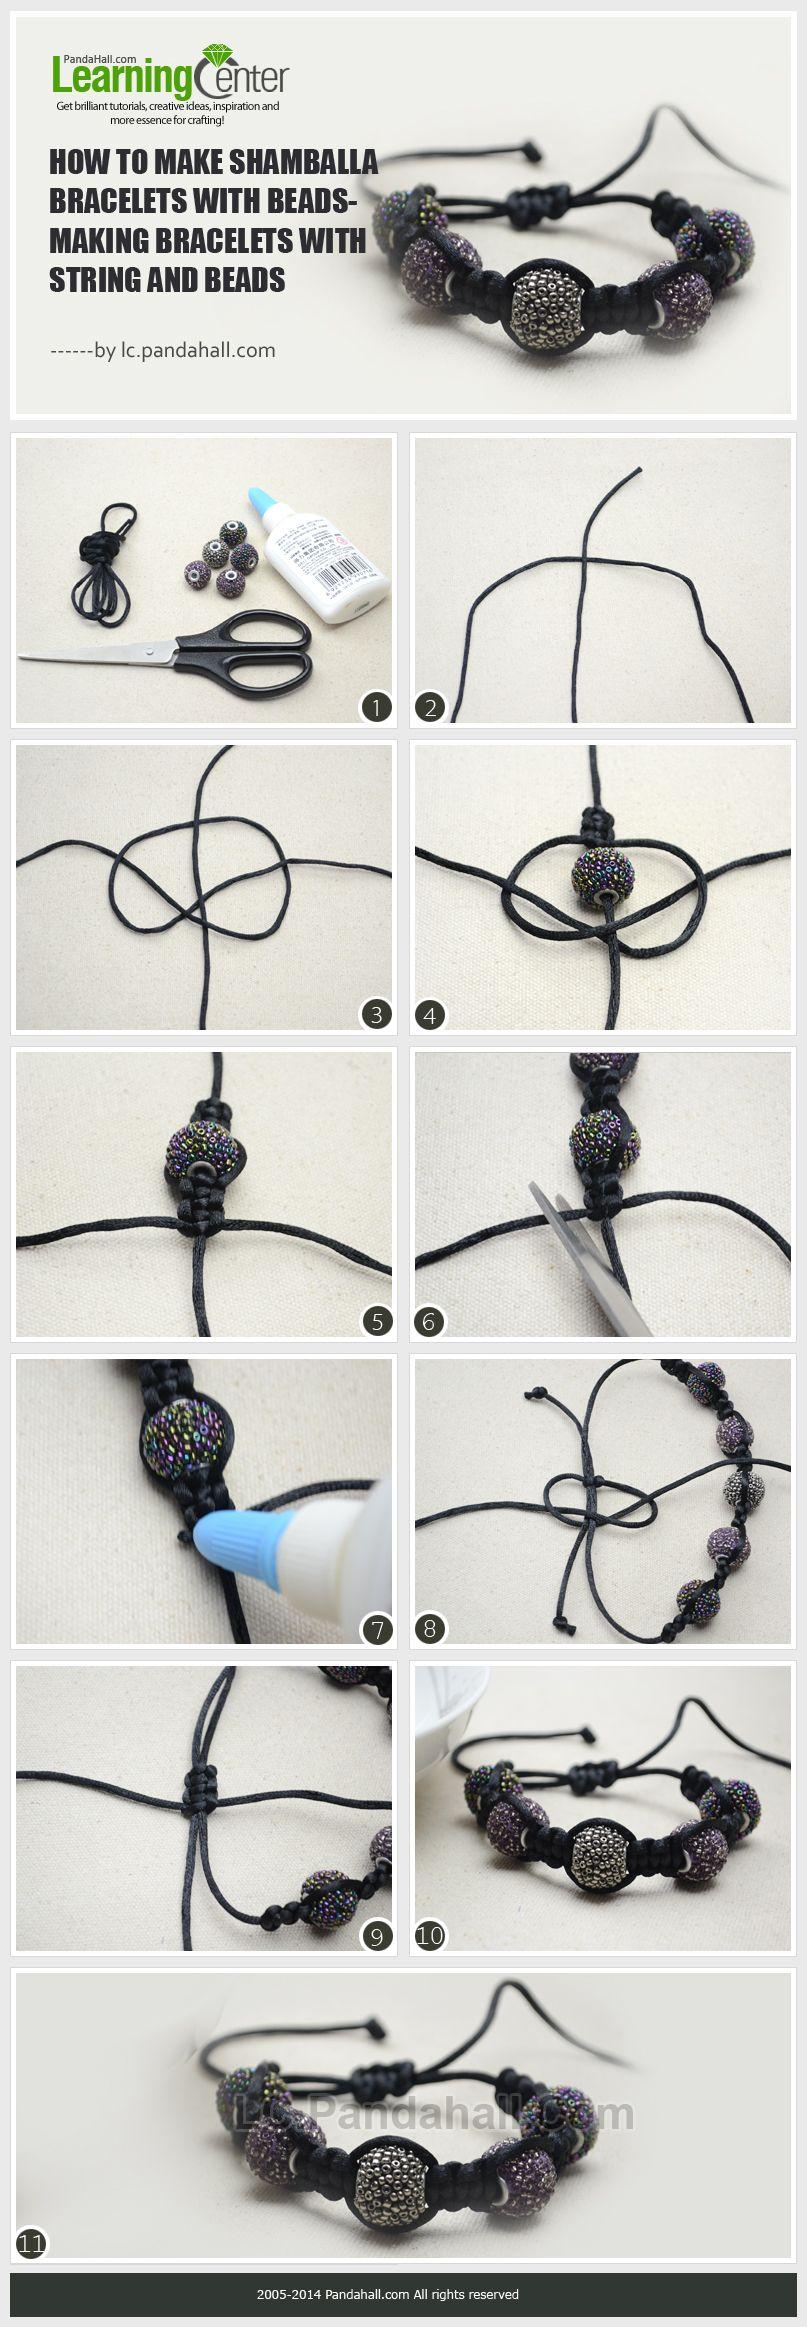 how do i make a cool shamballa style bracelet with